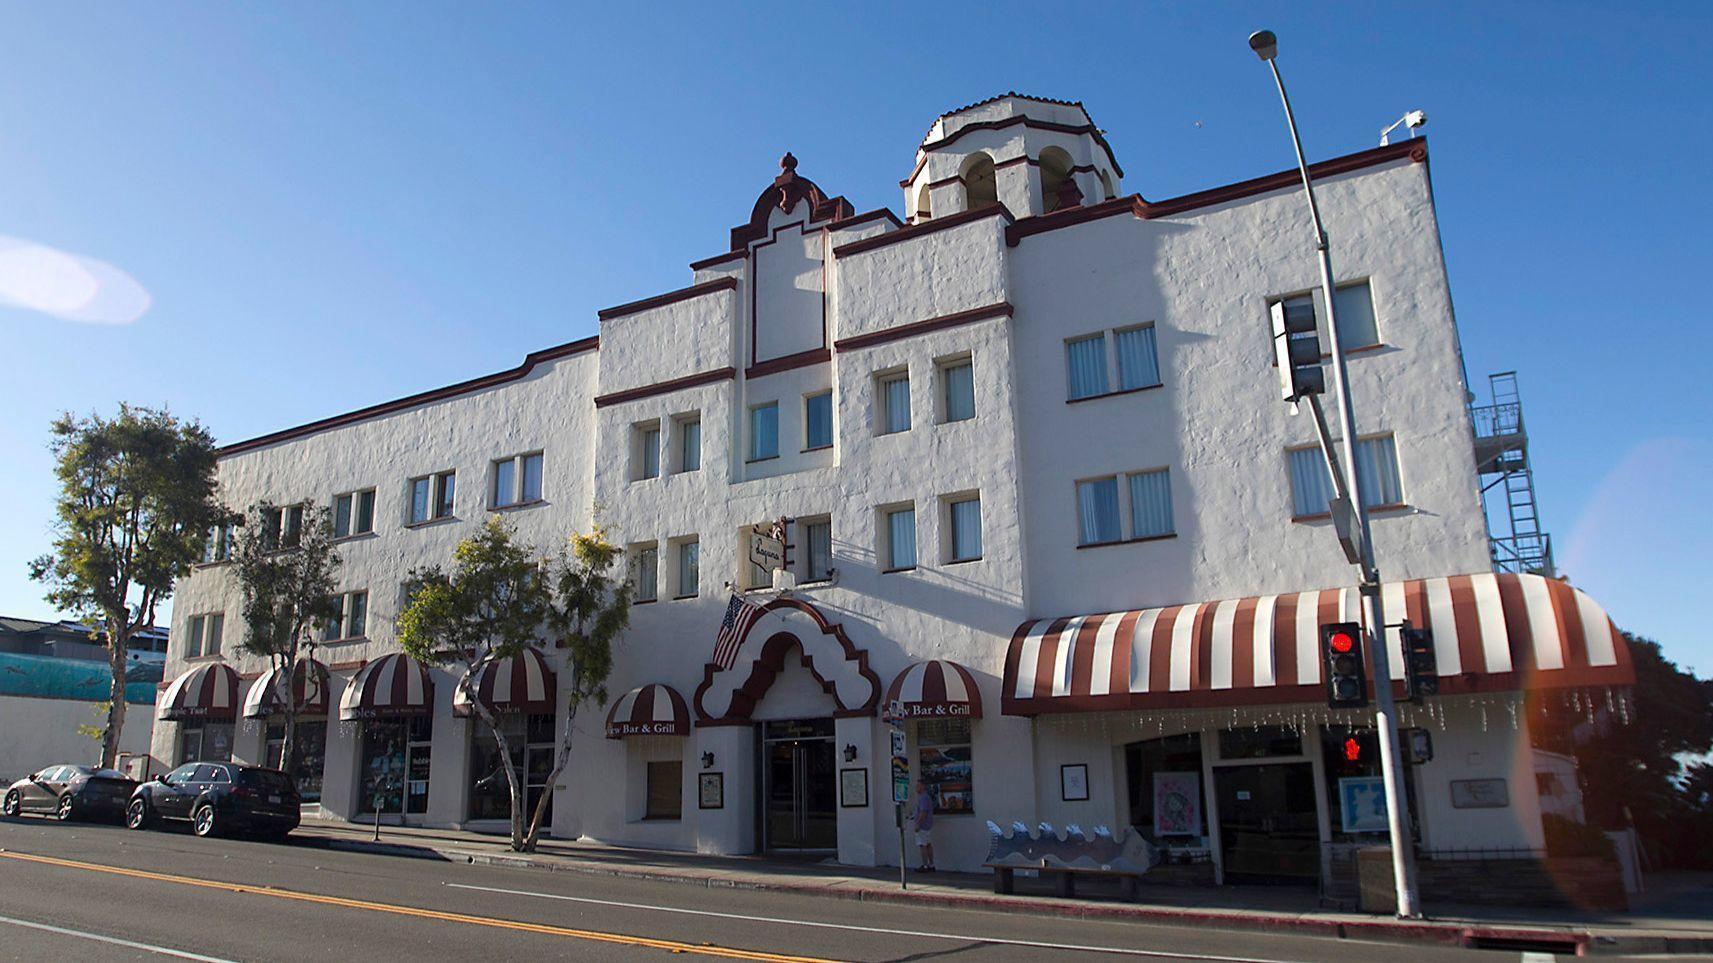 3 businesses remain open at shuttered hotel laguna. Black Bedroom Furniture Sets. Home Design Ideas